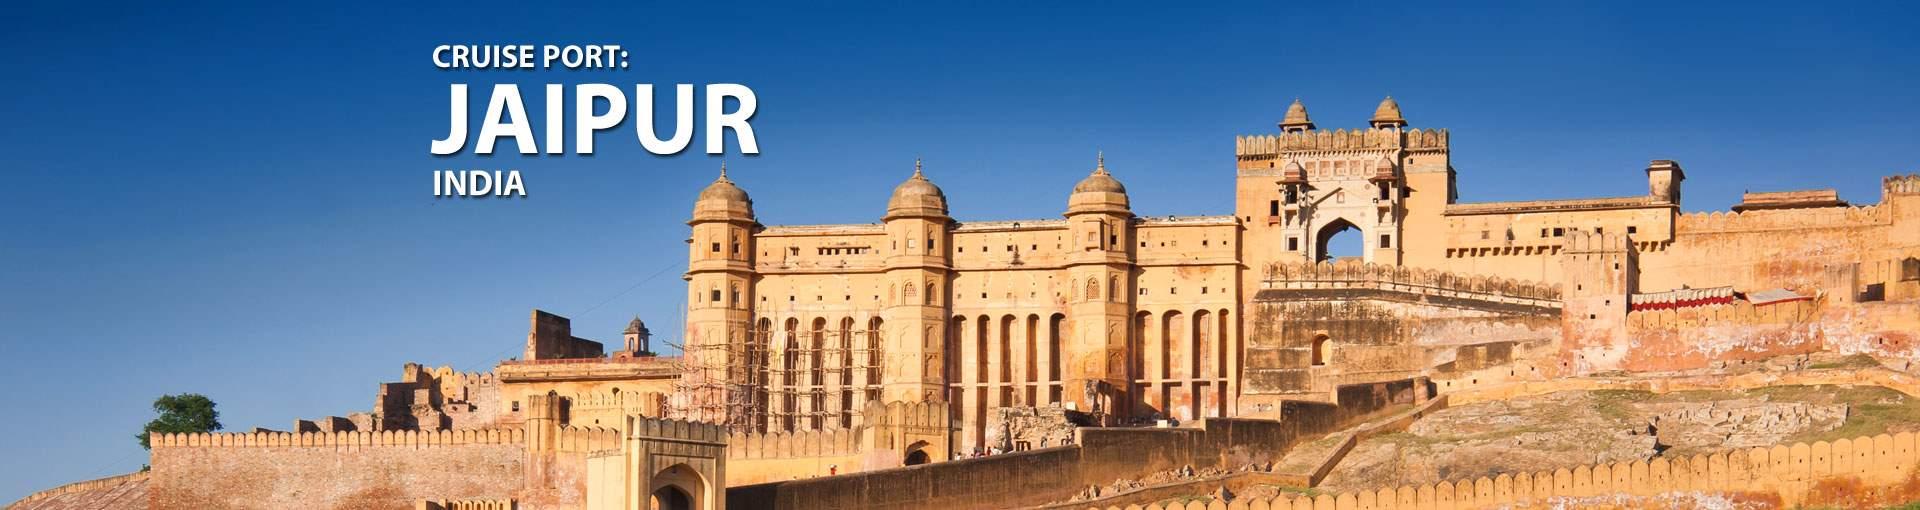 Cruises to Jaipur India